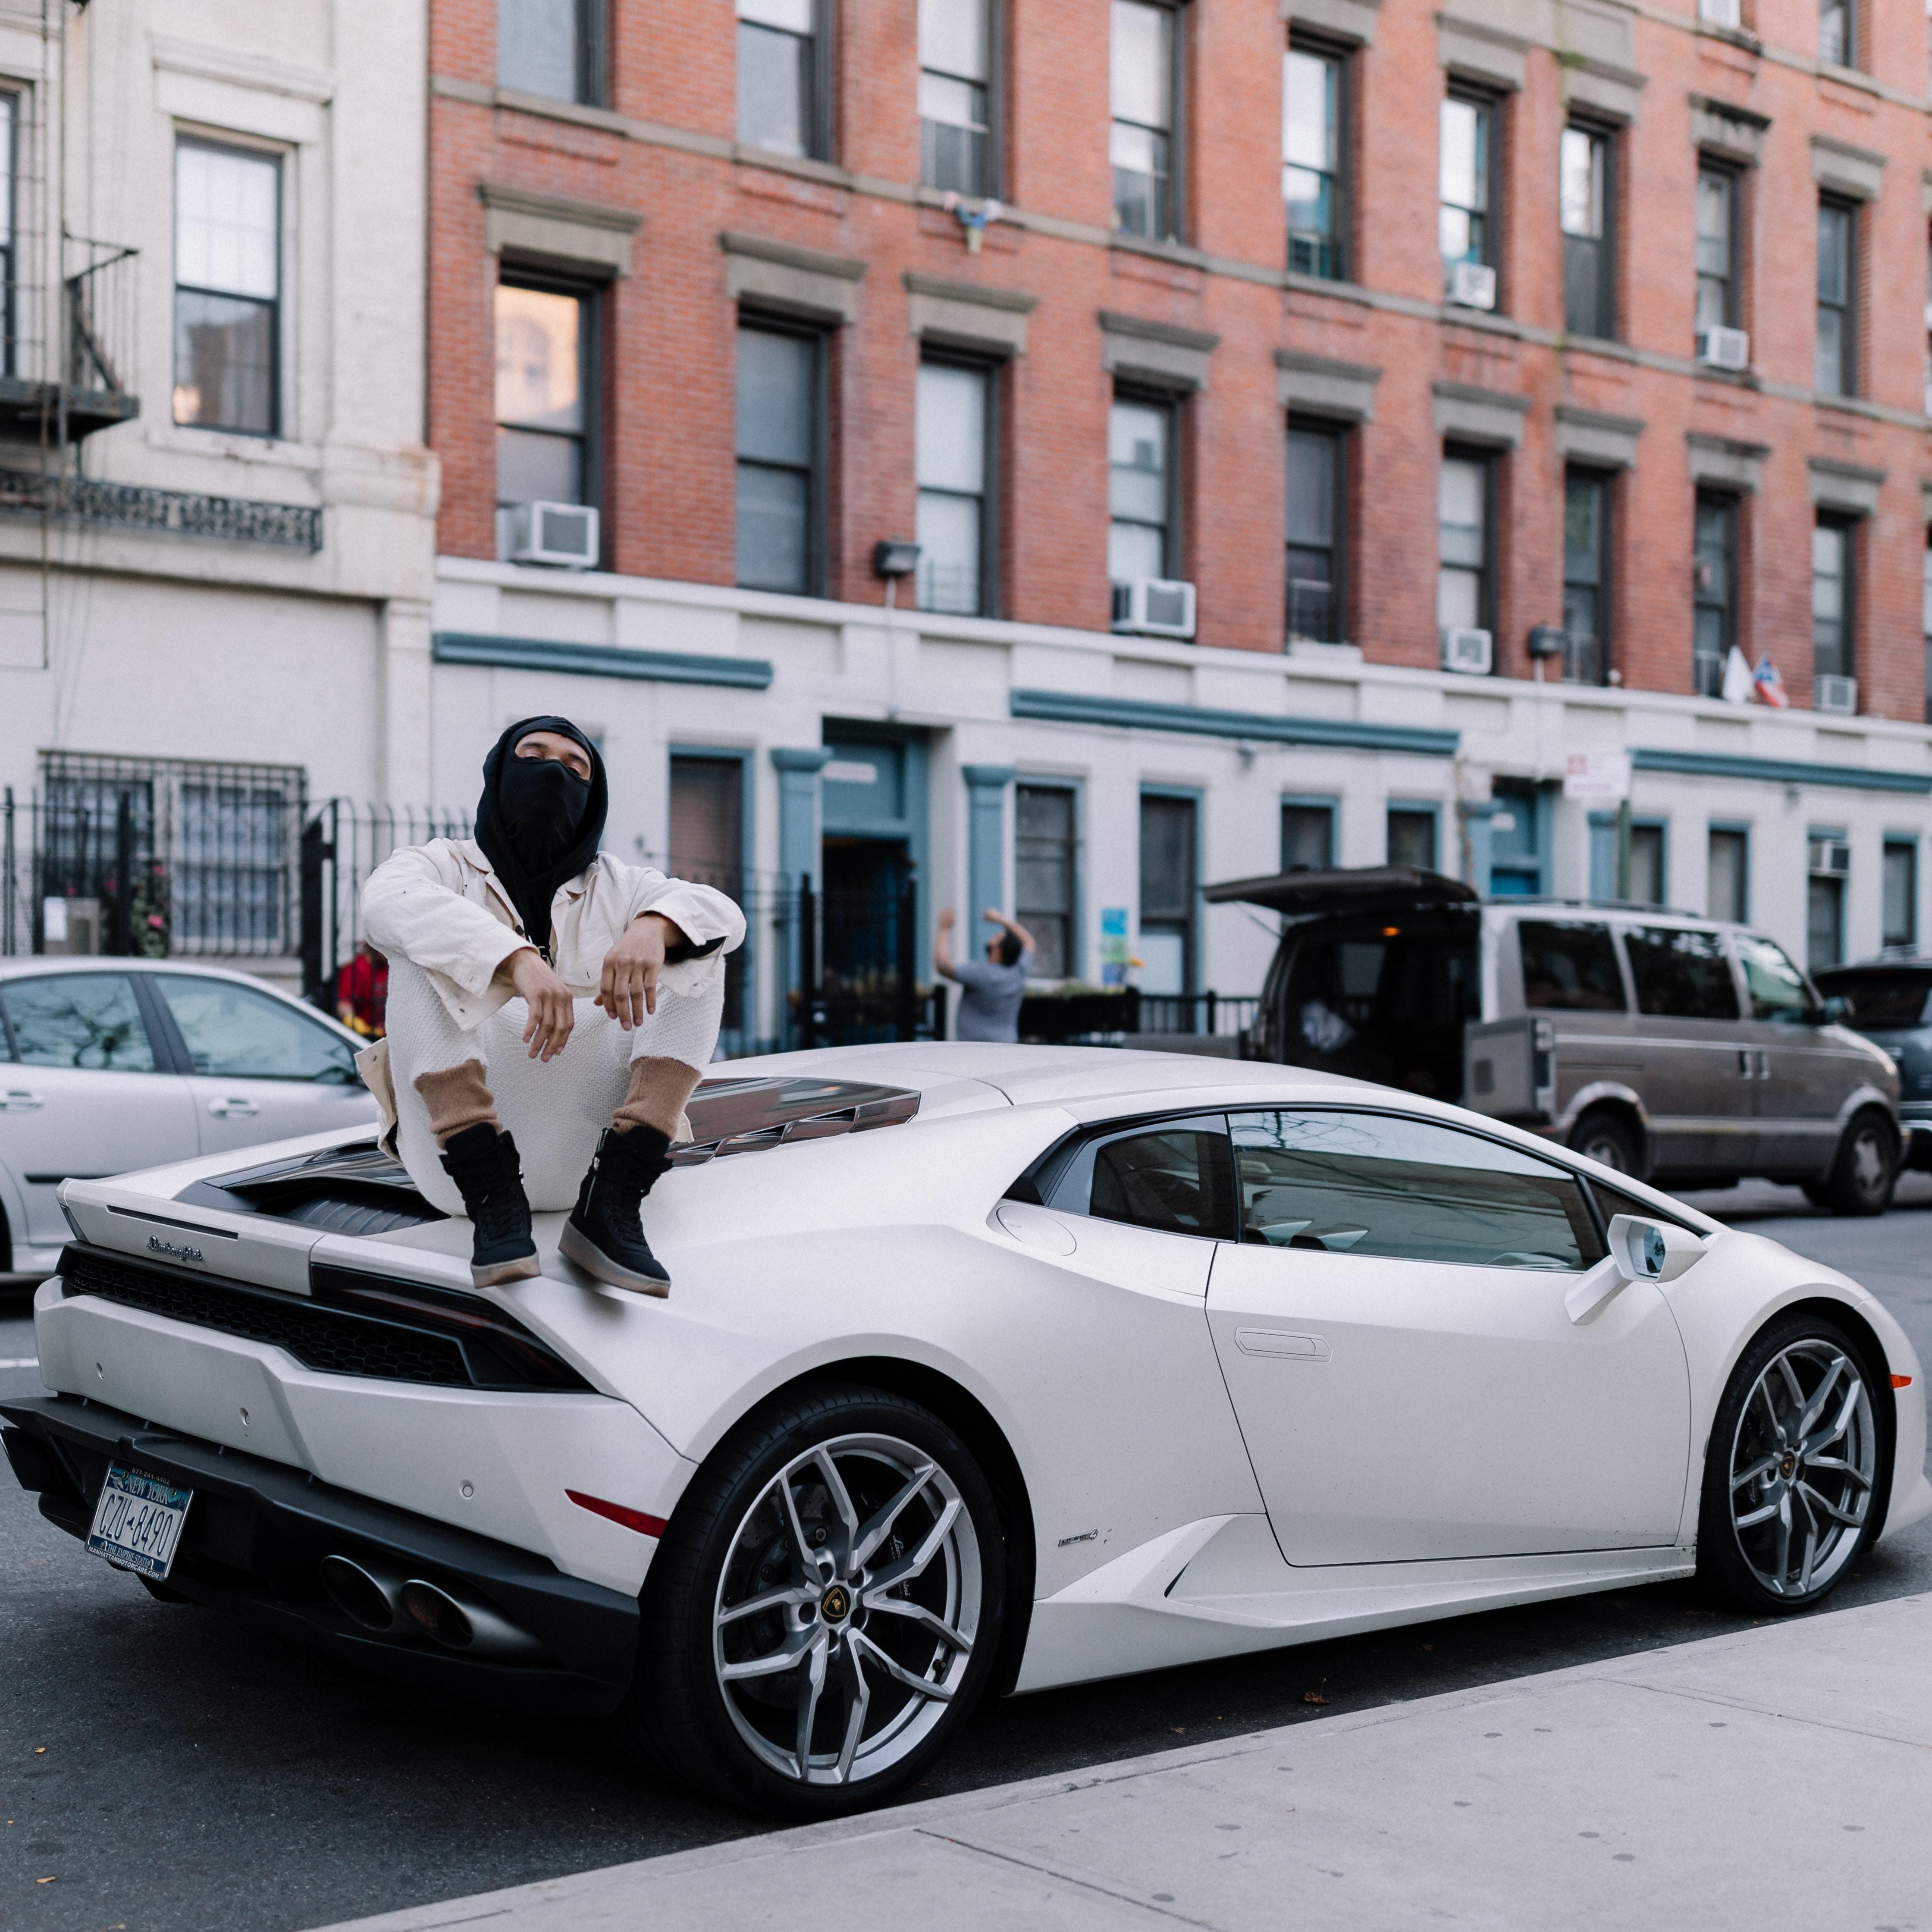 93217 download wallpaper Cars, Lamborghini Gallardo, Guy, Style, Urban screensavers and pictures for free